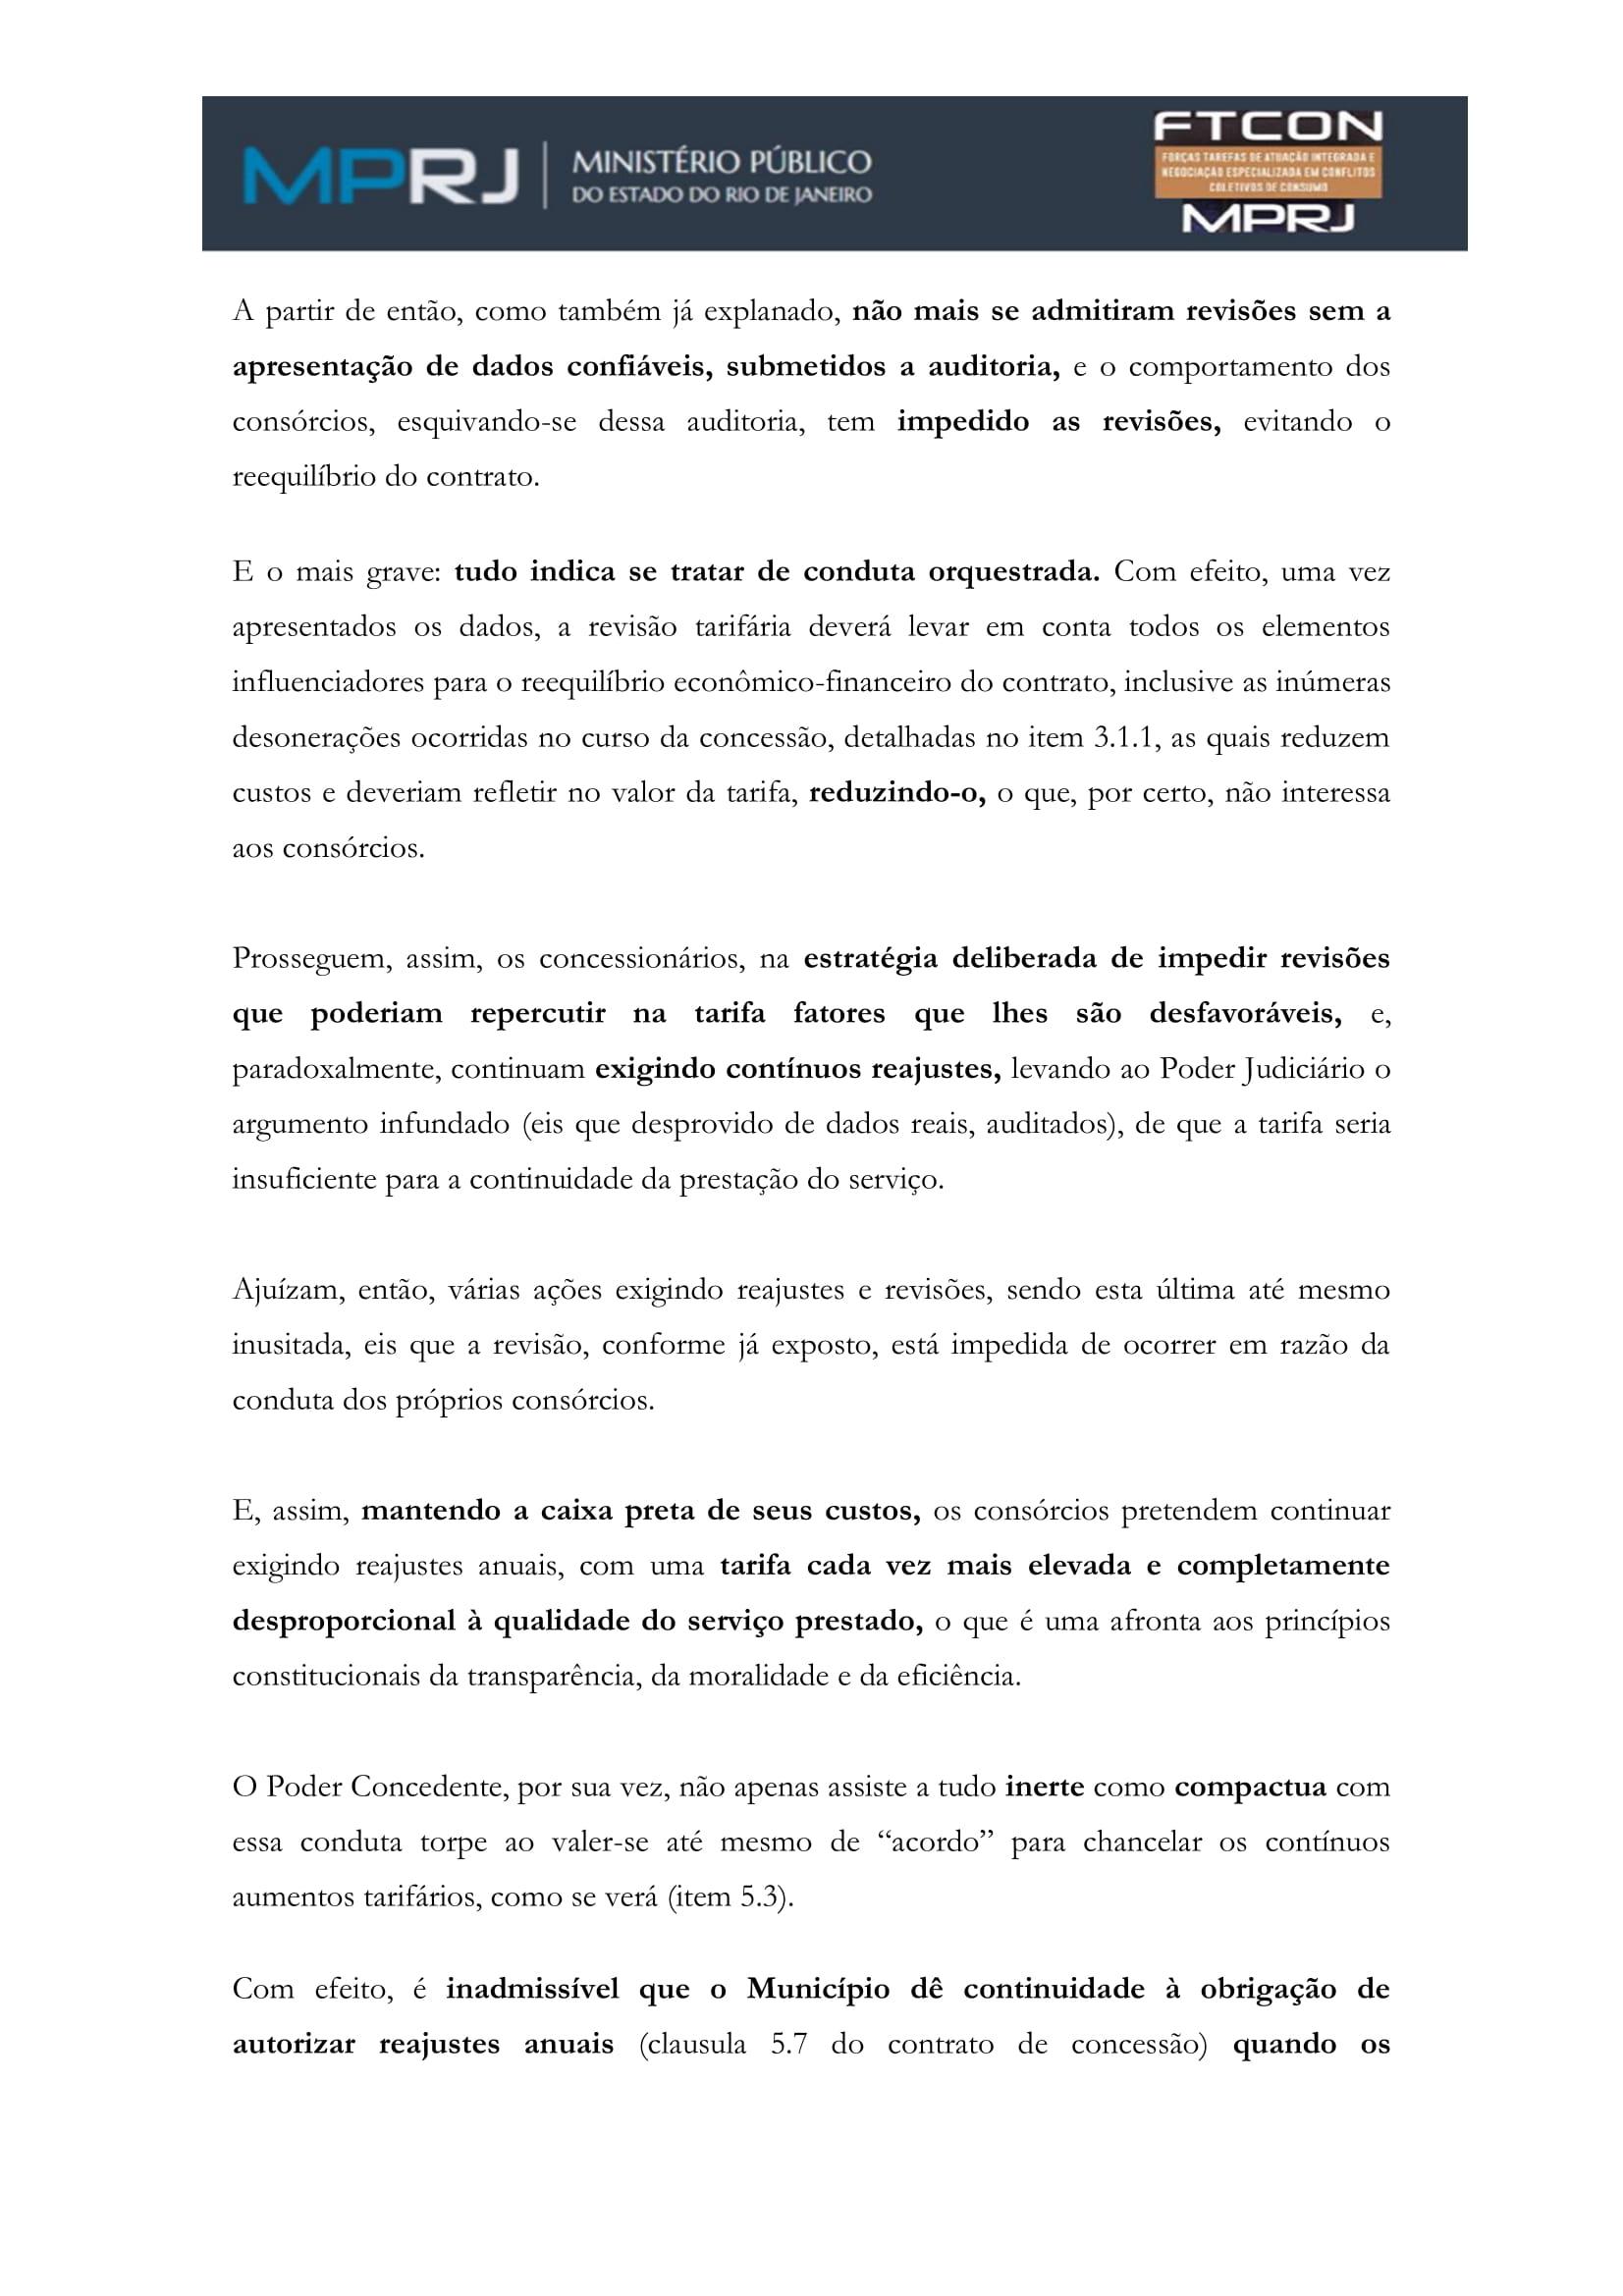 acp_caducidade_onibus_dr_rt-052